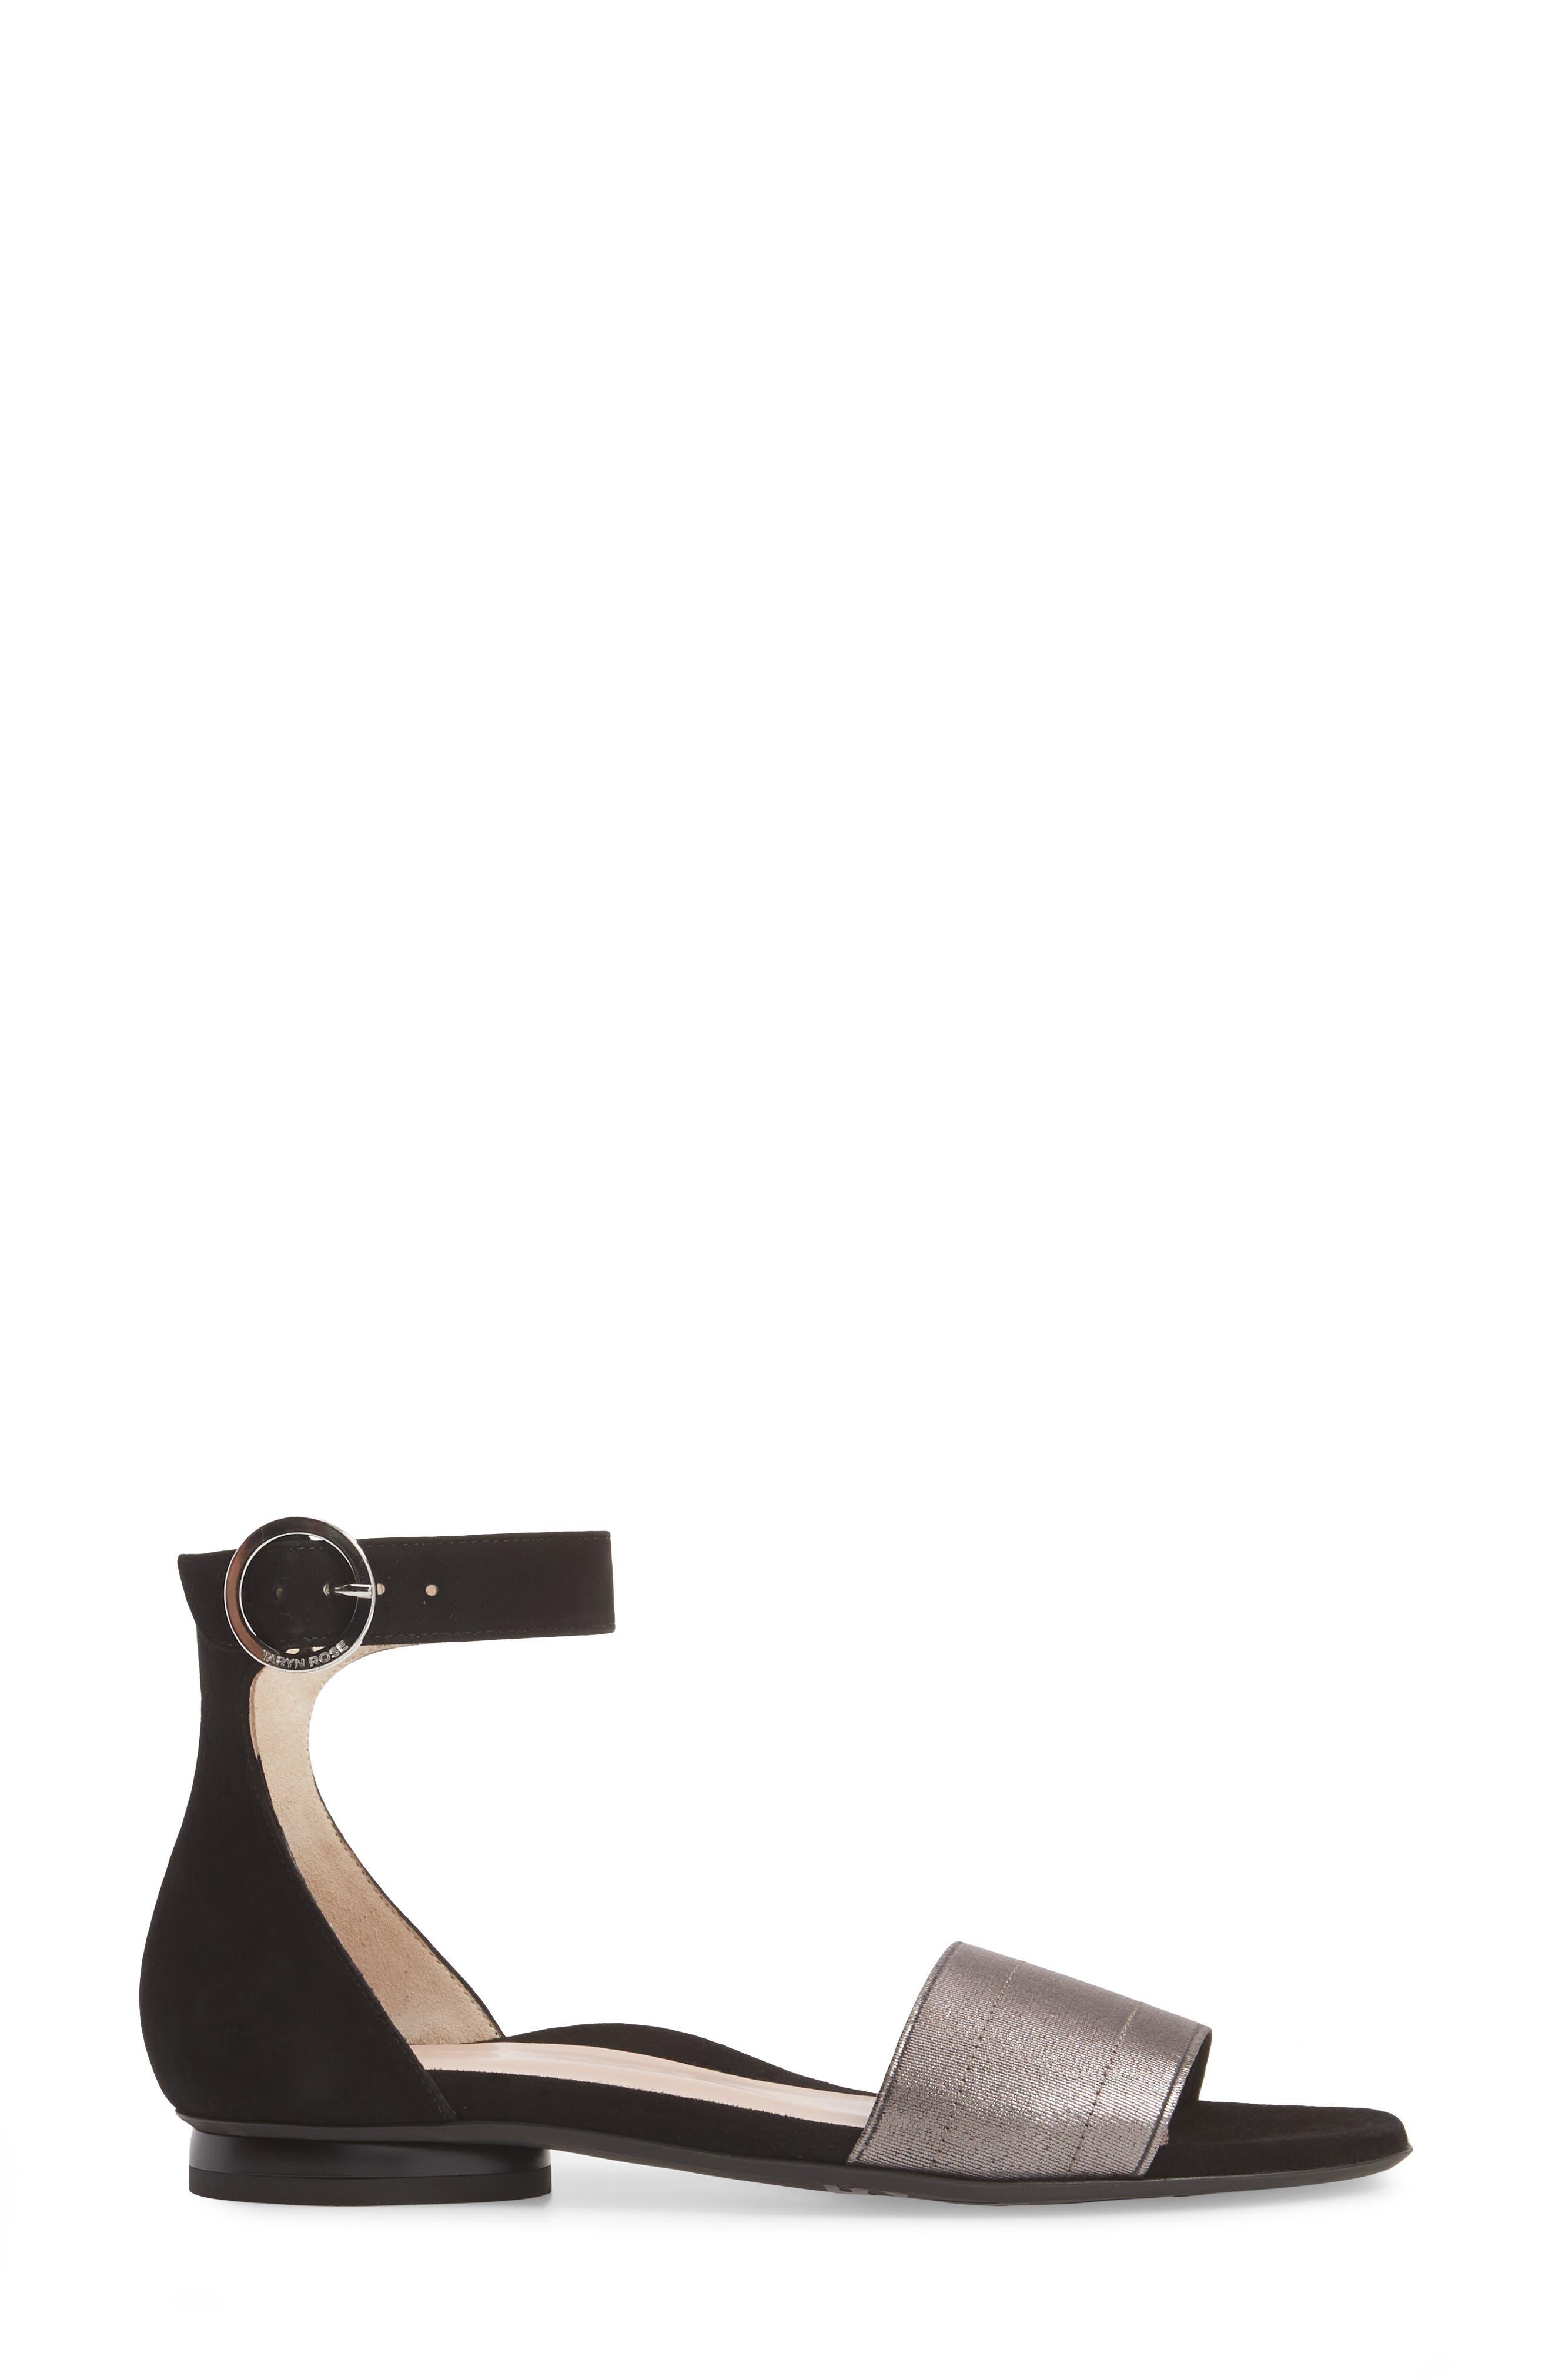 Donati Ankle Strap Sandal,                             Alternate thumbnail 3, color,                             Black/ Gunmetal Suede